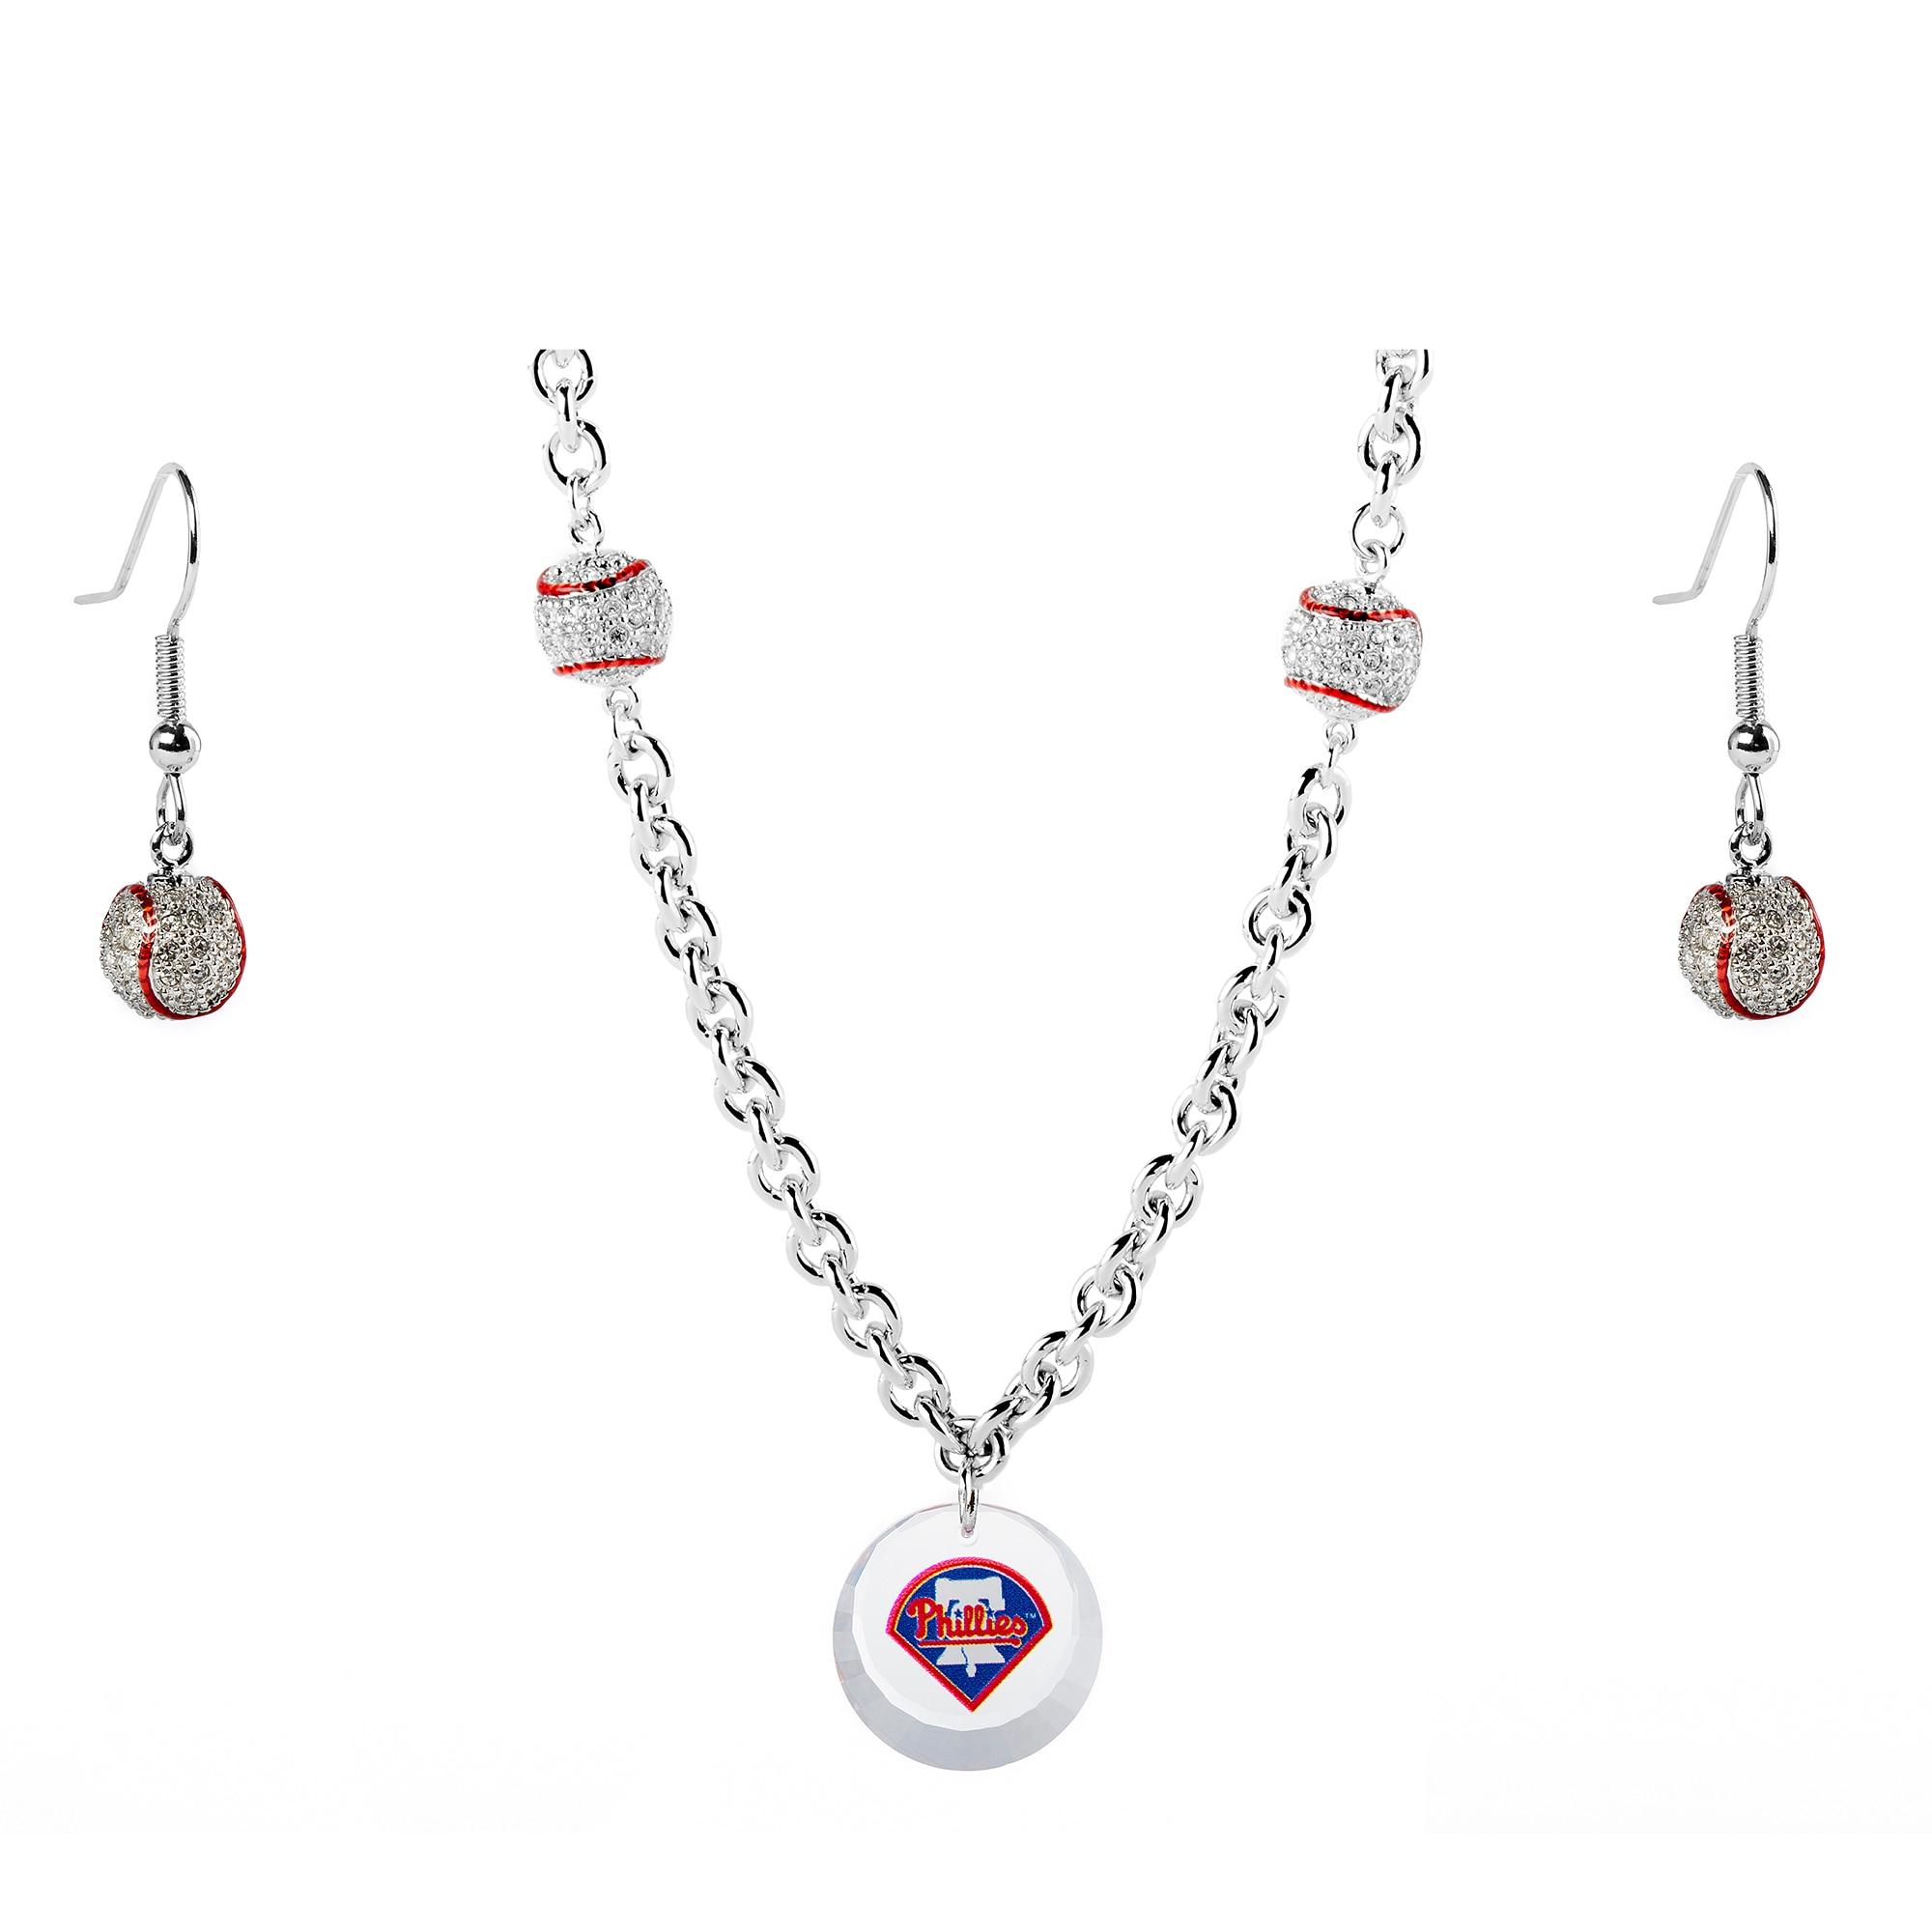 Philadelphia Phillies Crystals from Swarovski Baseball Necklace & Earrings